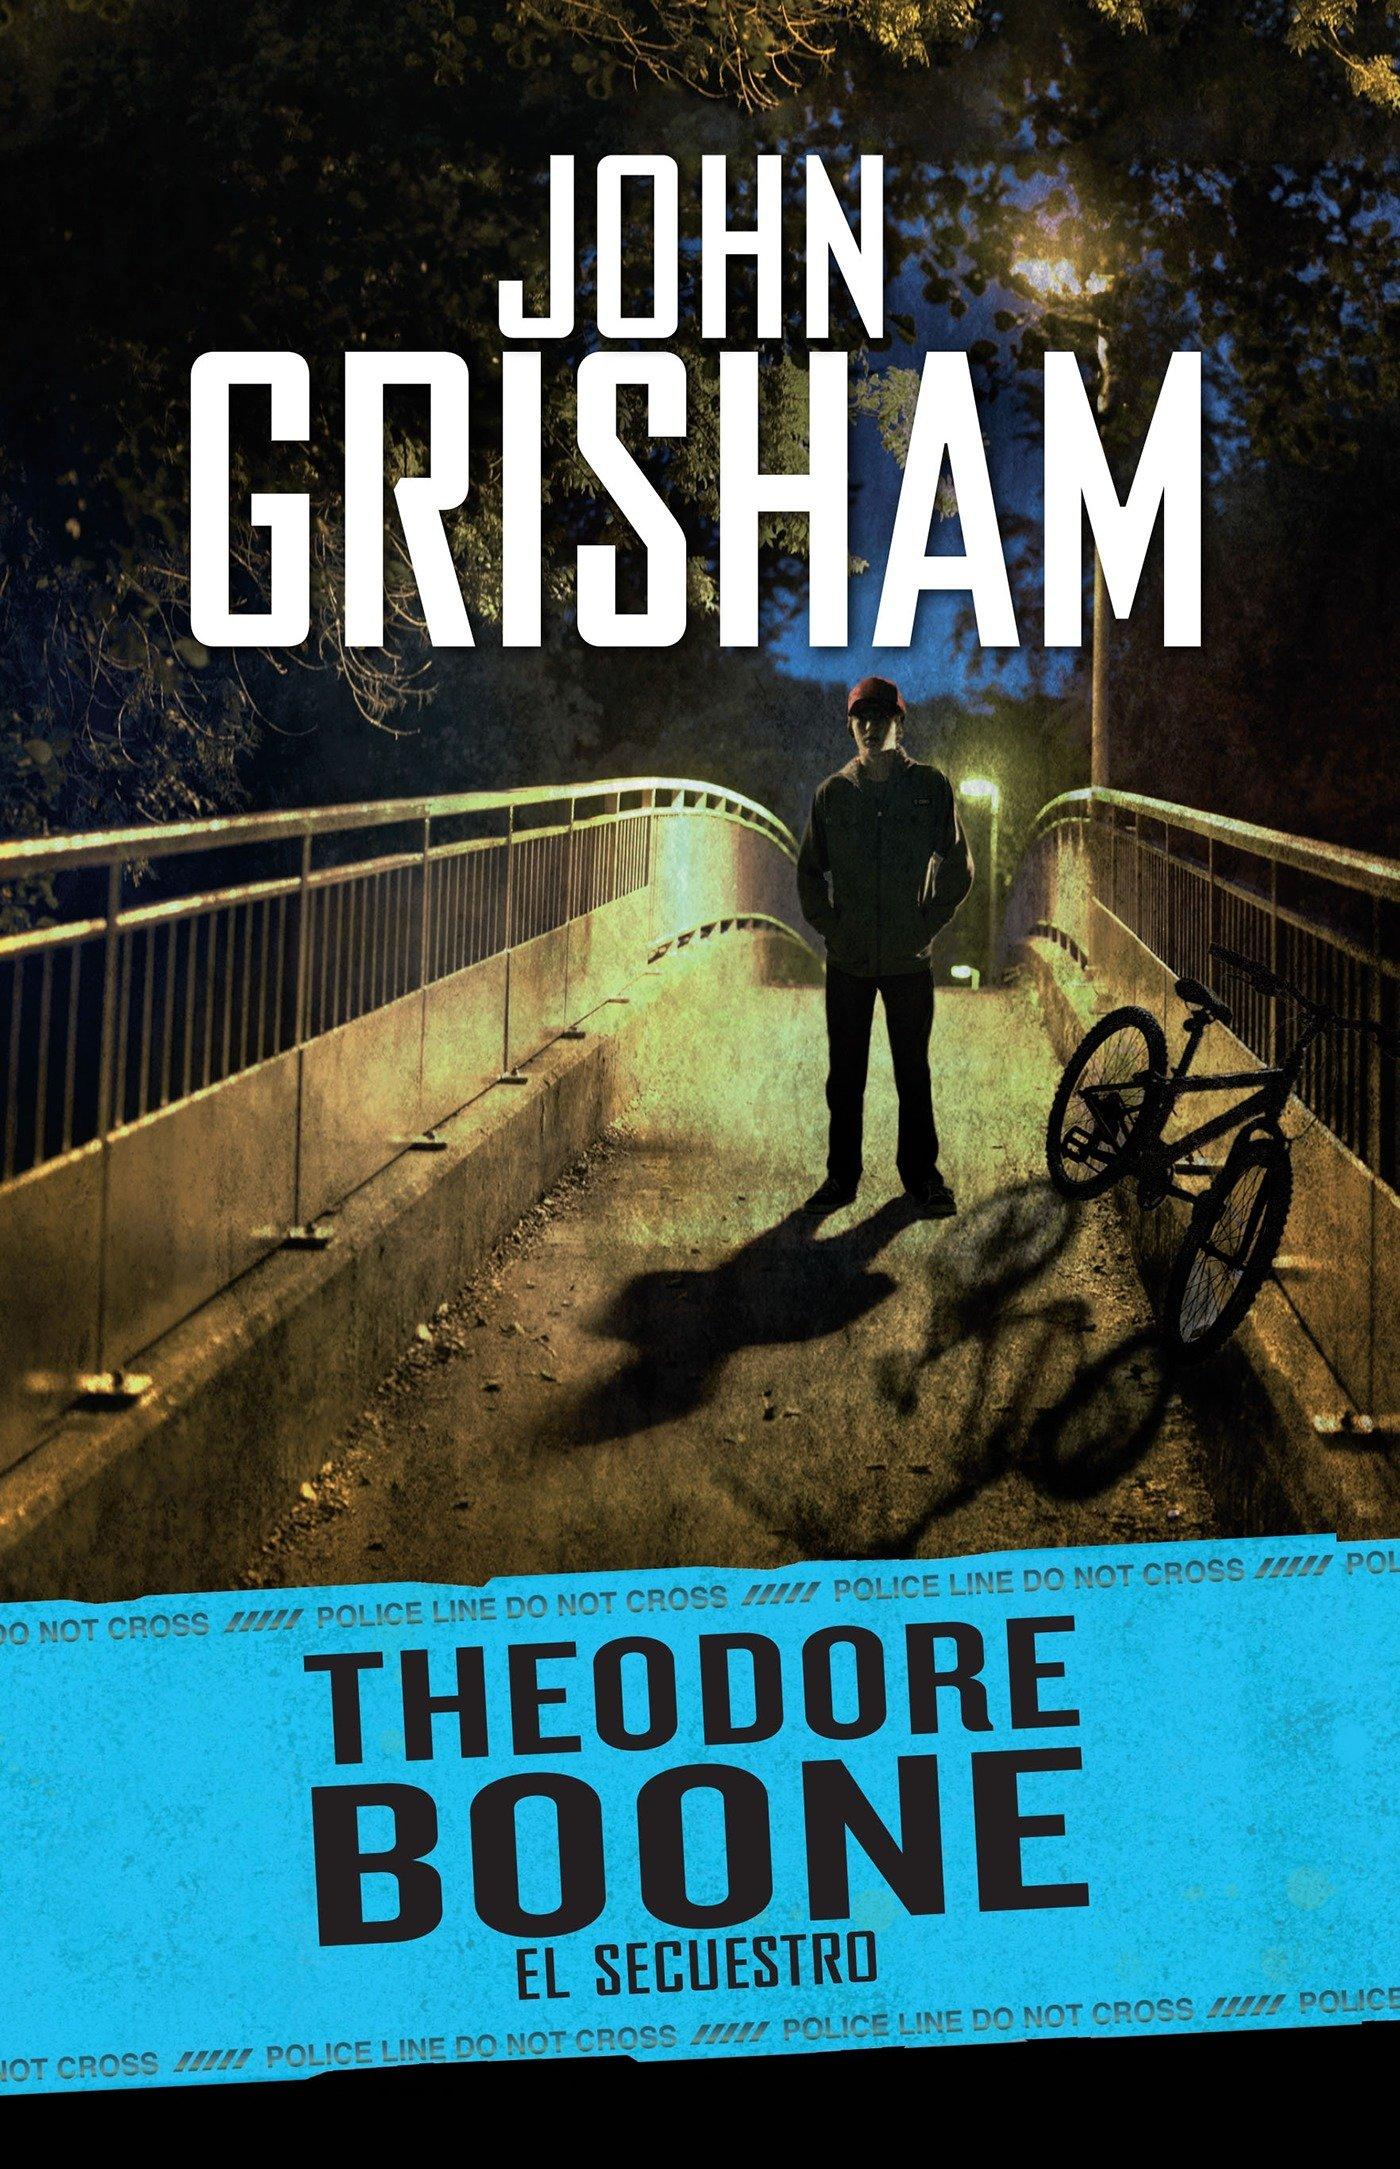 Theodore Boone 2. El secuestro (Spanish Edition): John Grisham: 9786073113809: Amazon.com: Books